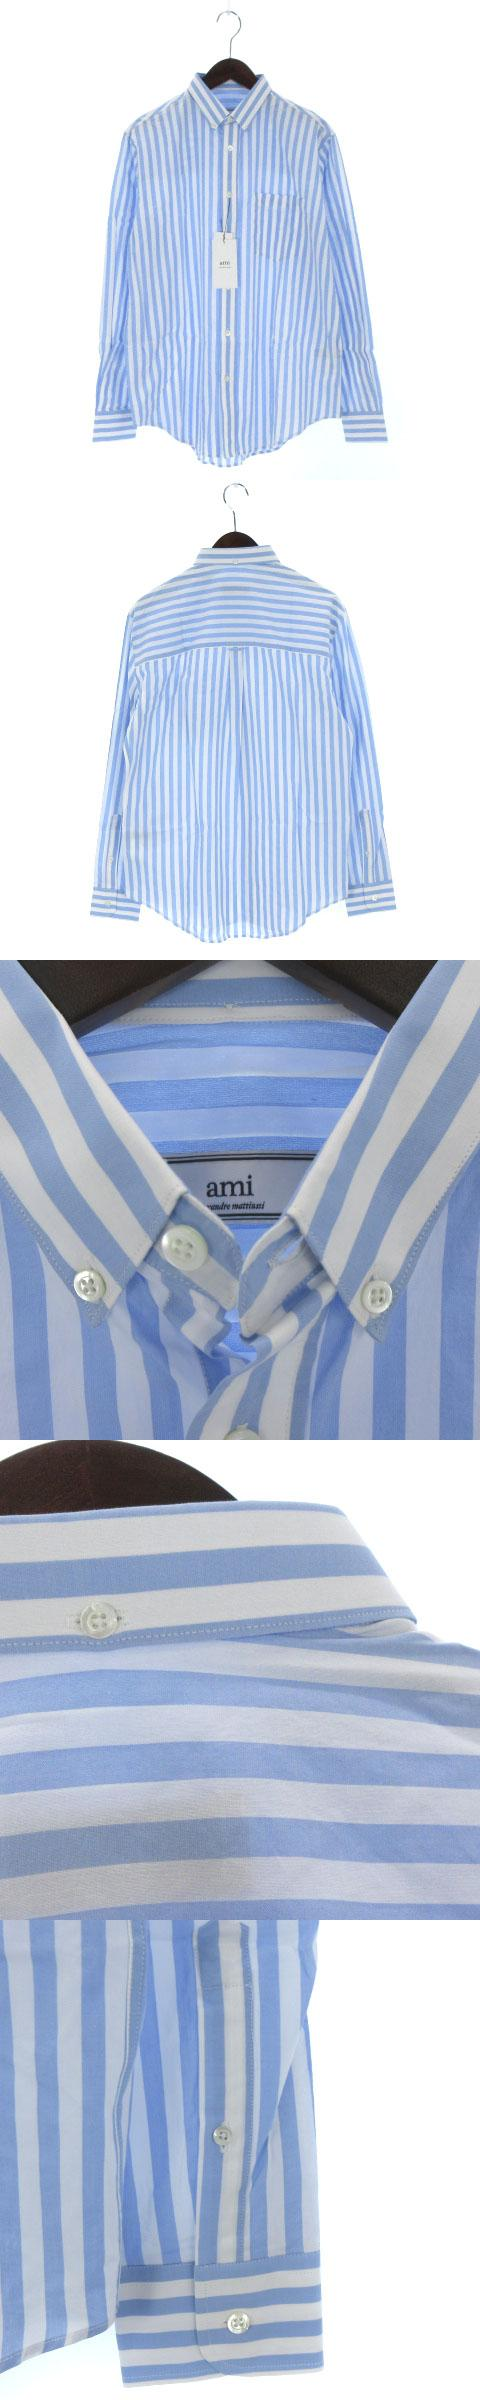 STRIPED SHIRT シャツ ドレス ワイ 長袖 ストライプ ボタンダウン E16C05.50 ライトブルー 青 スカイブルー 水色 39